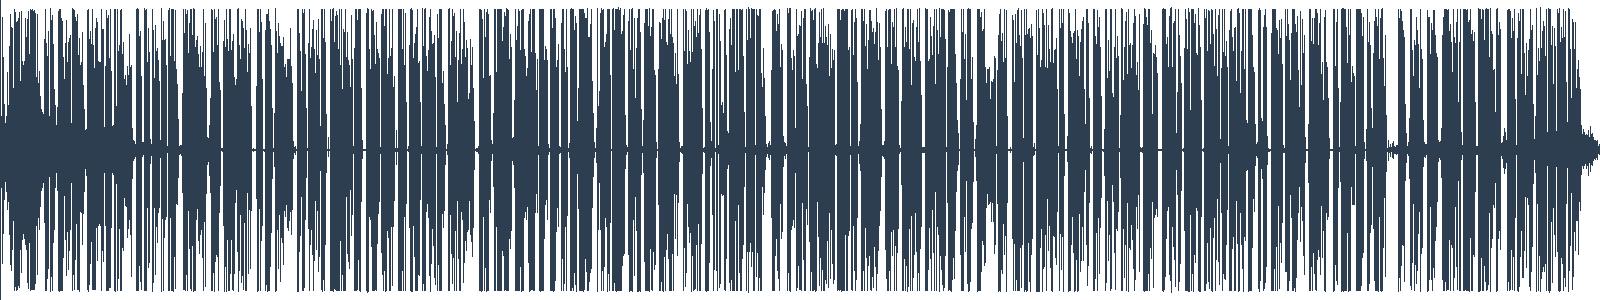 #9 P. O. Hviezdoslav a jeho lyrika (Maturita s Hashtagom) waveform